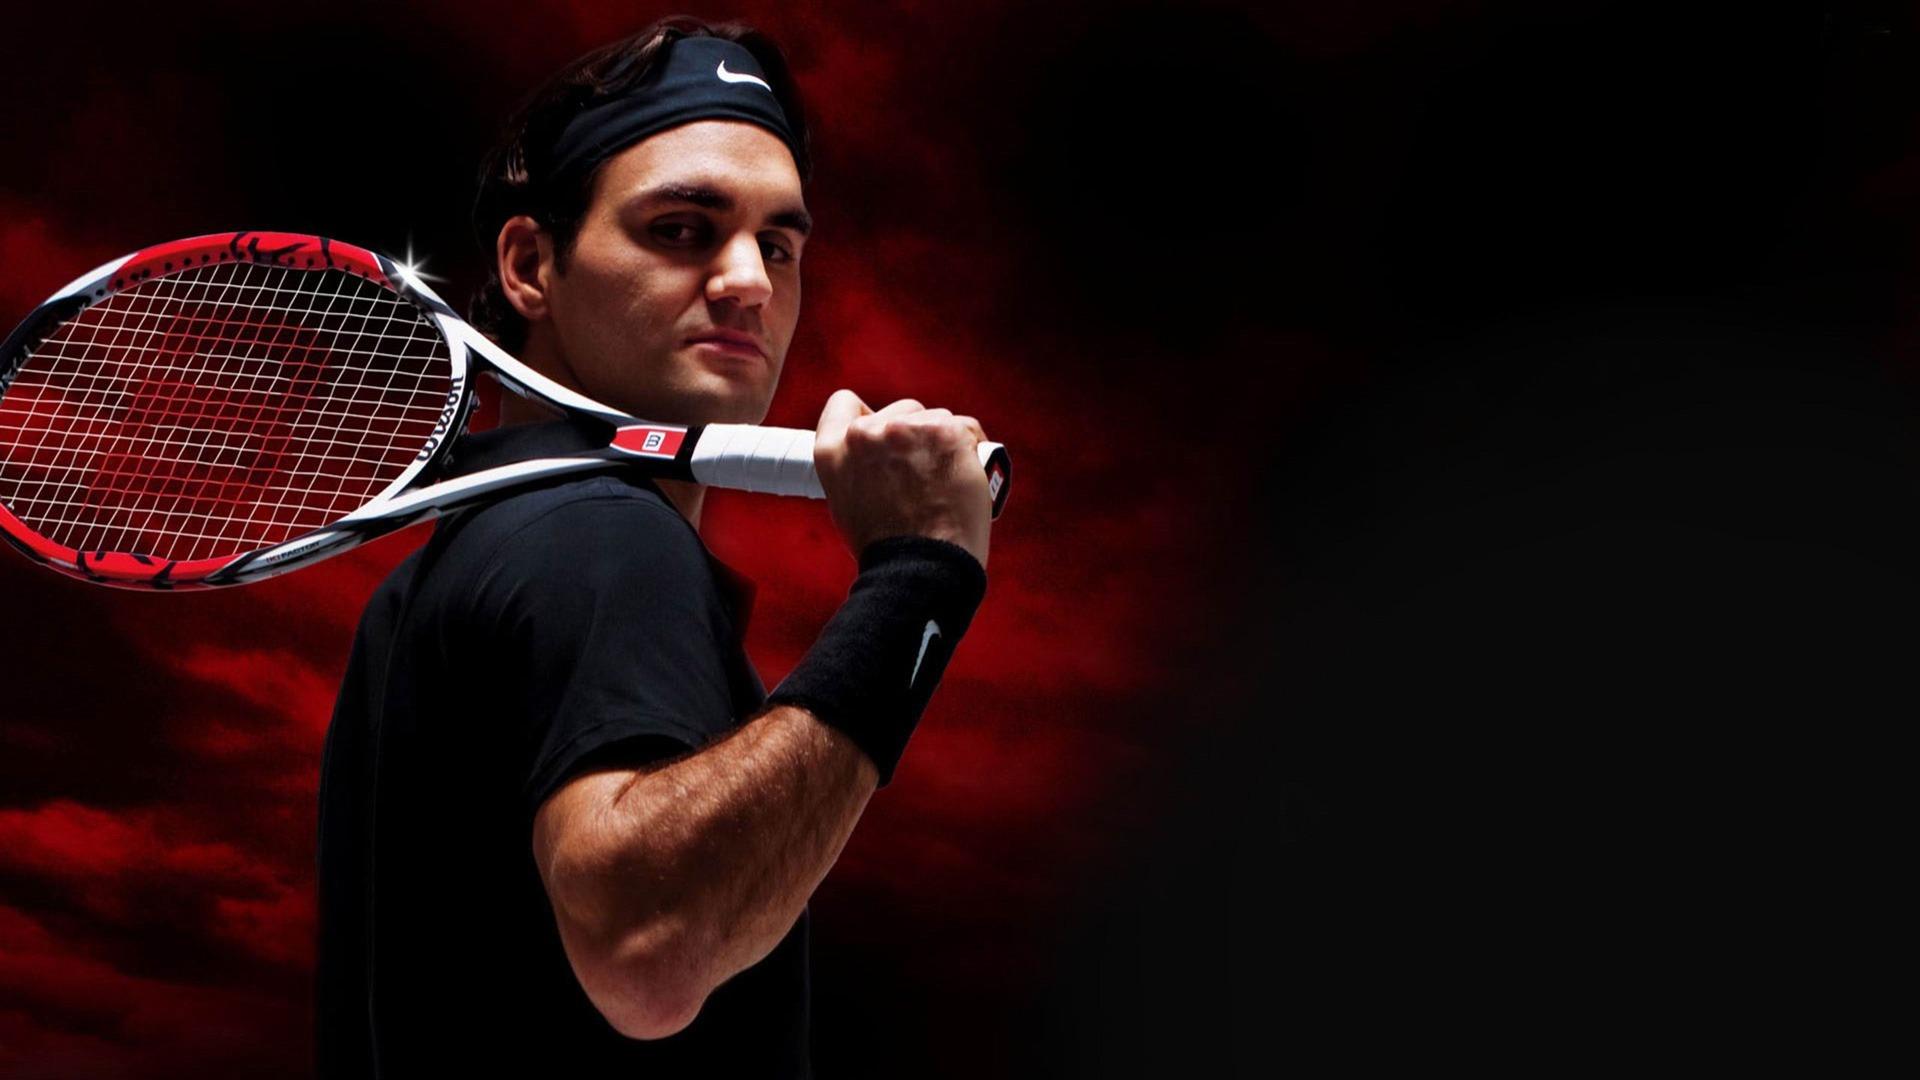 Roger Federer-Tennis Sport Desktop Wallpapers 03-1920x1080